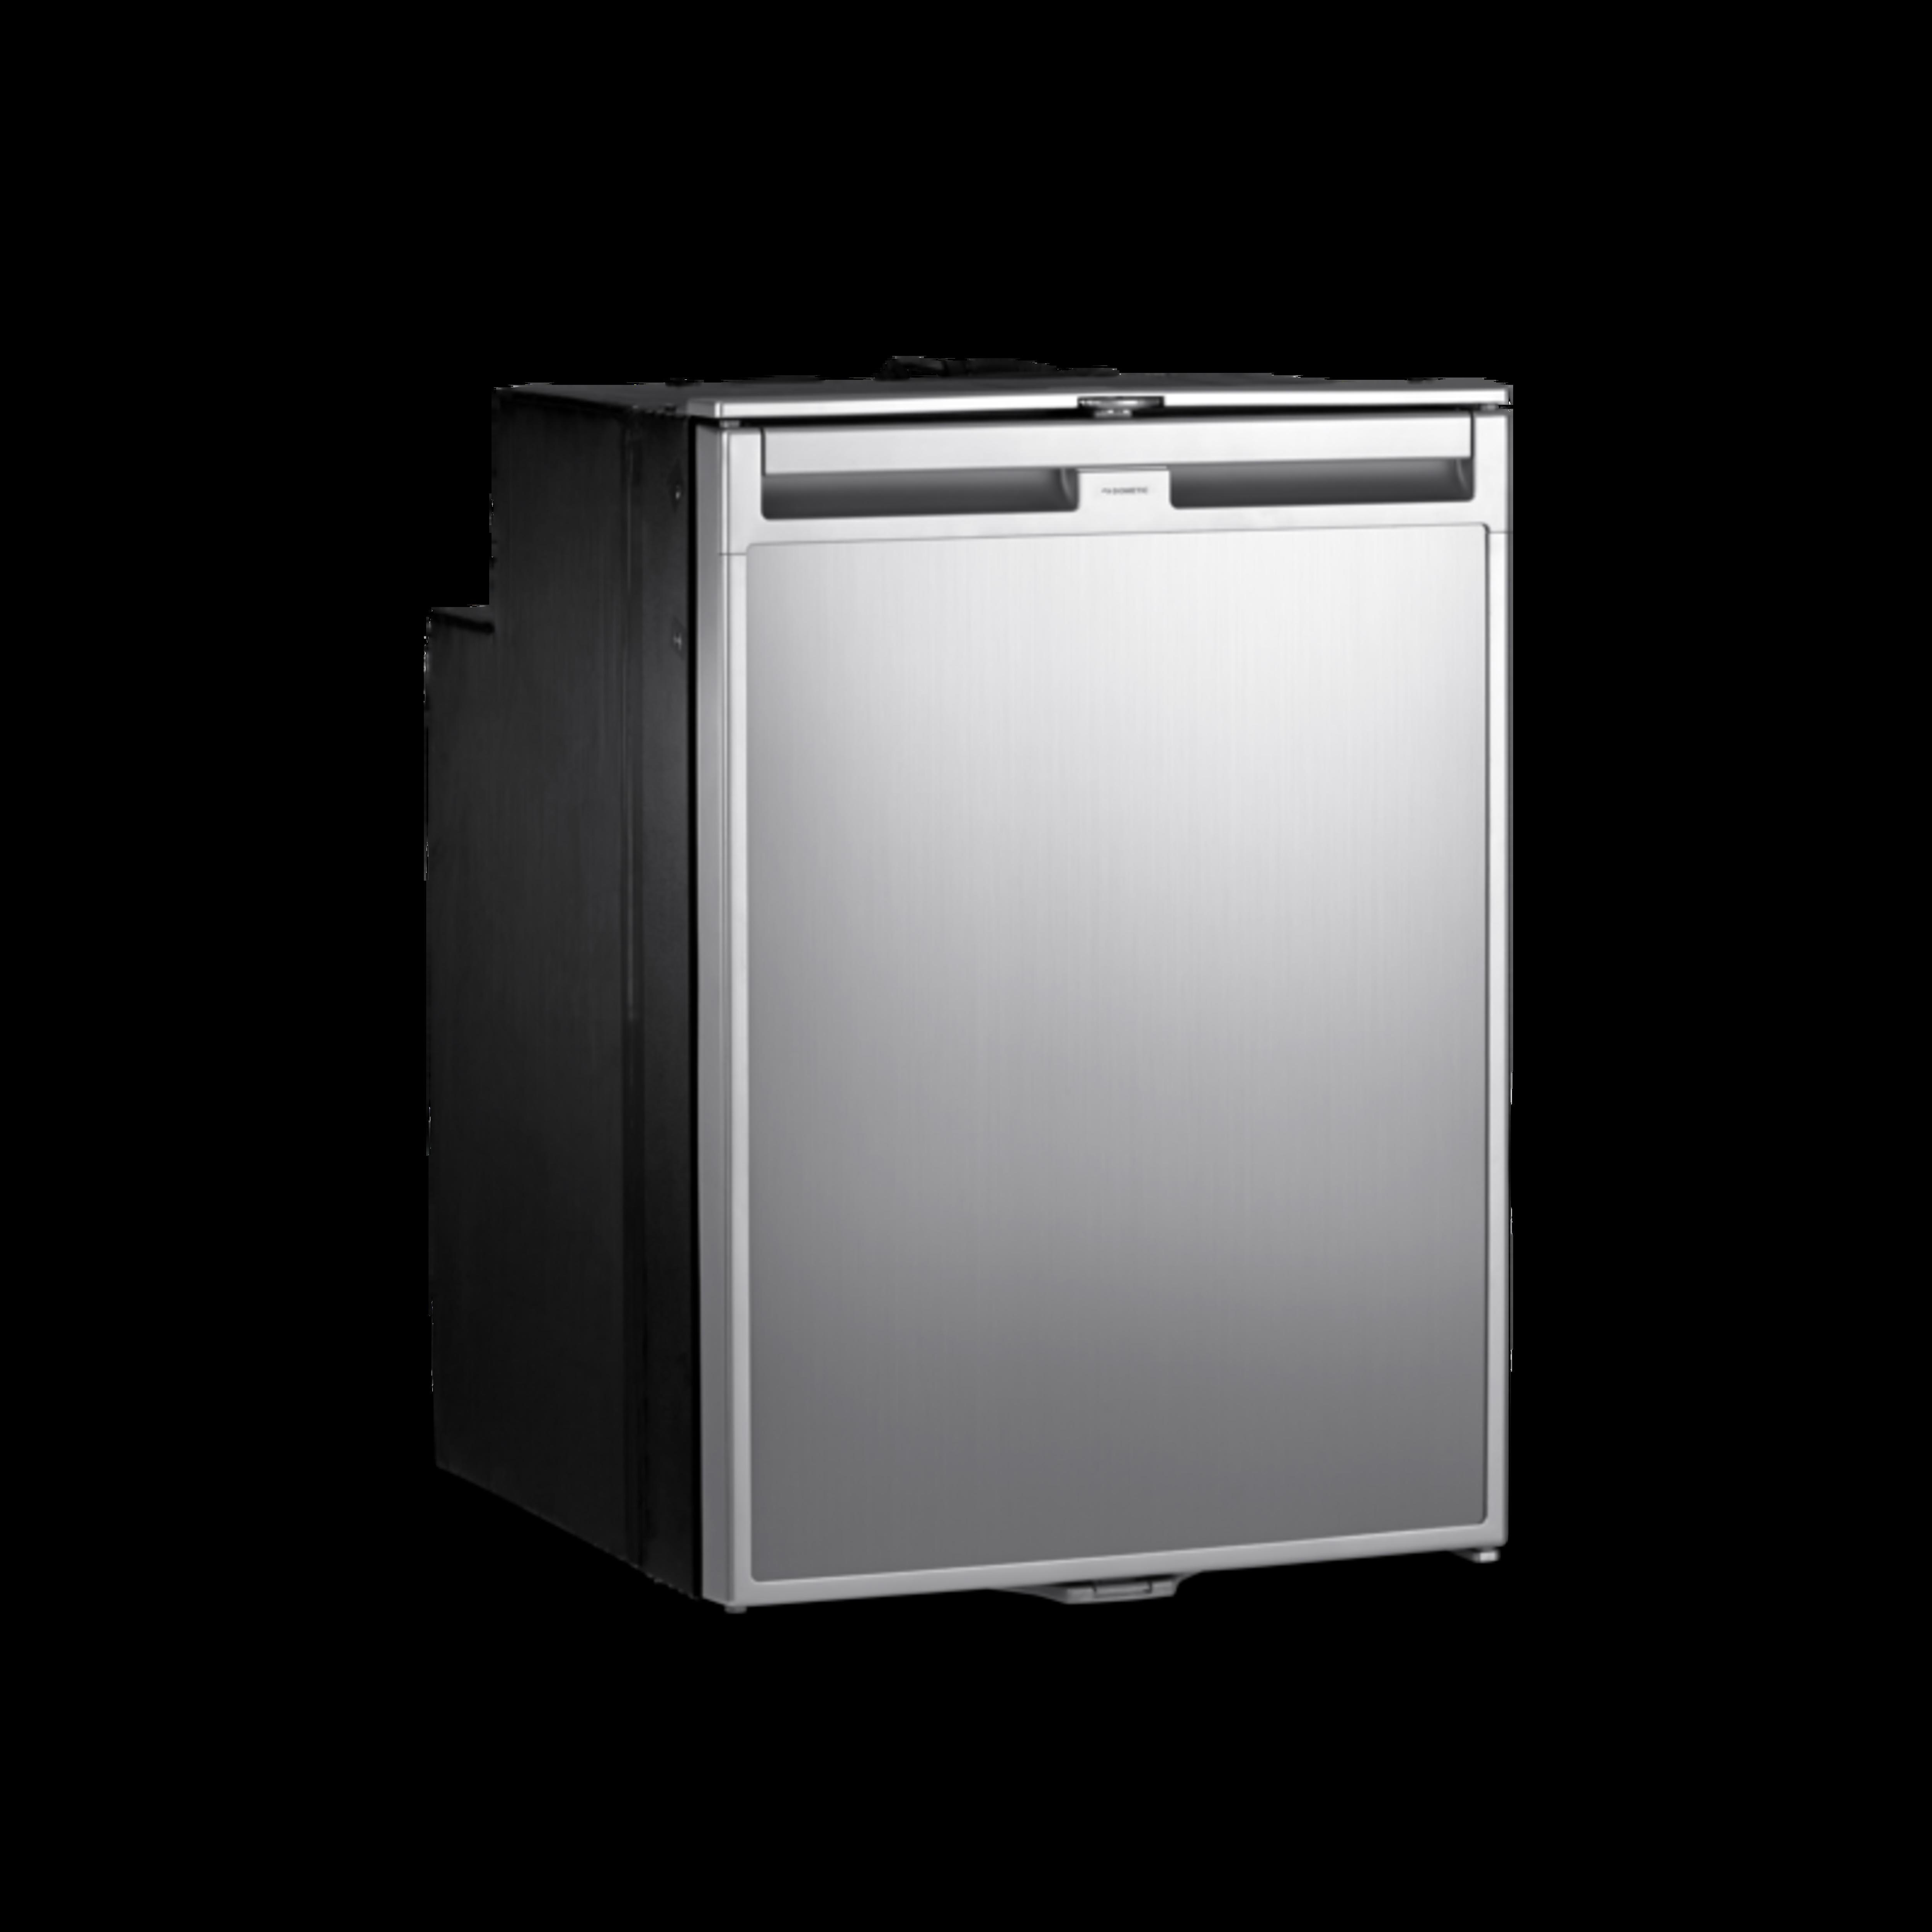 Dometic CoolMatic CRX 110